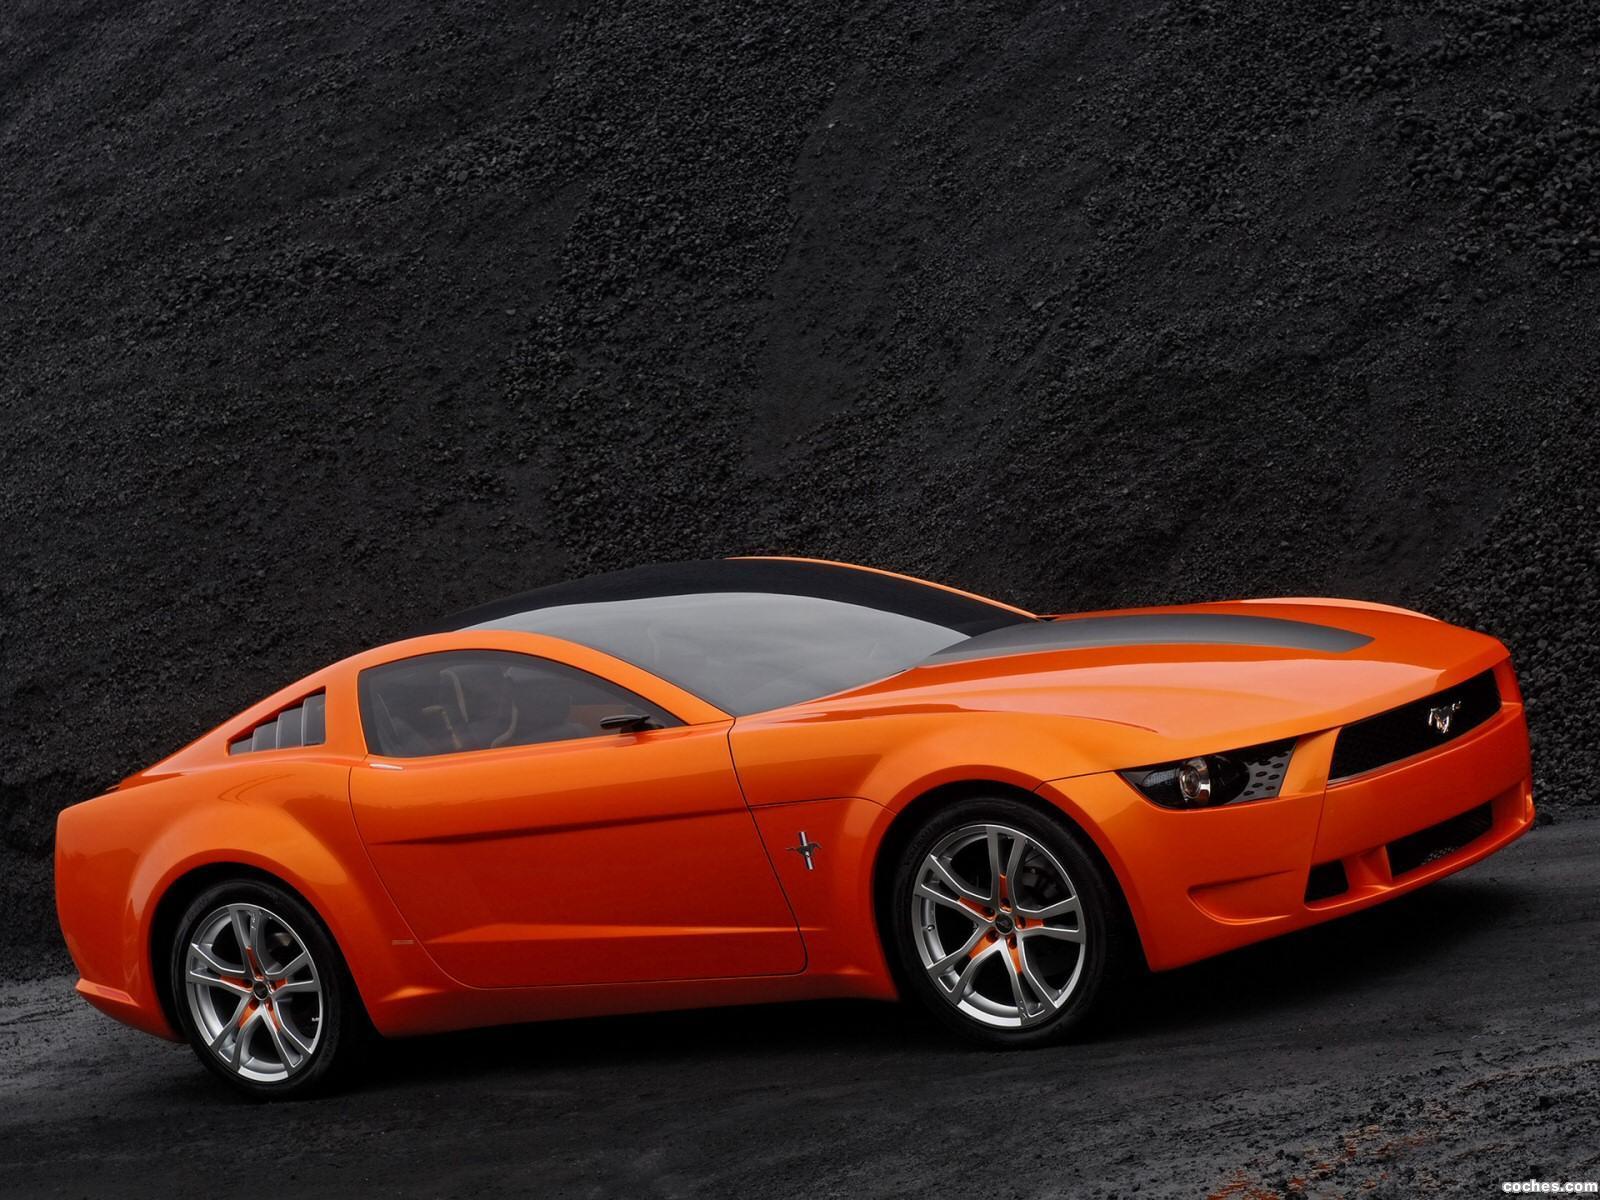 Foto 0 de Ford Mustang Concept Italdesign 2006